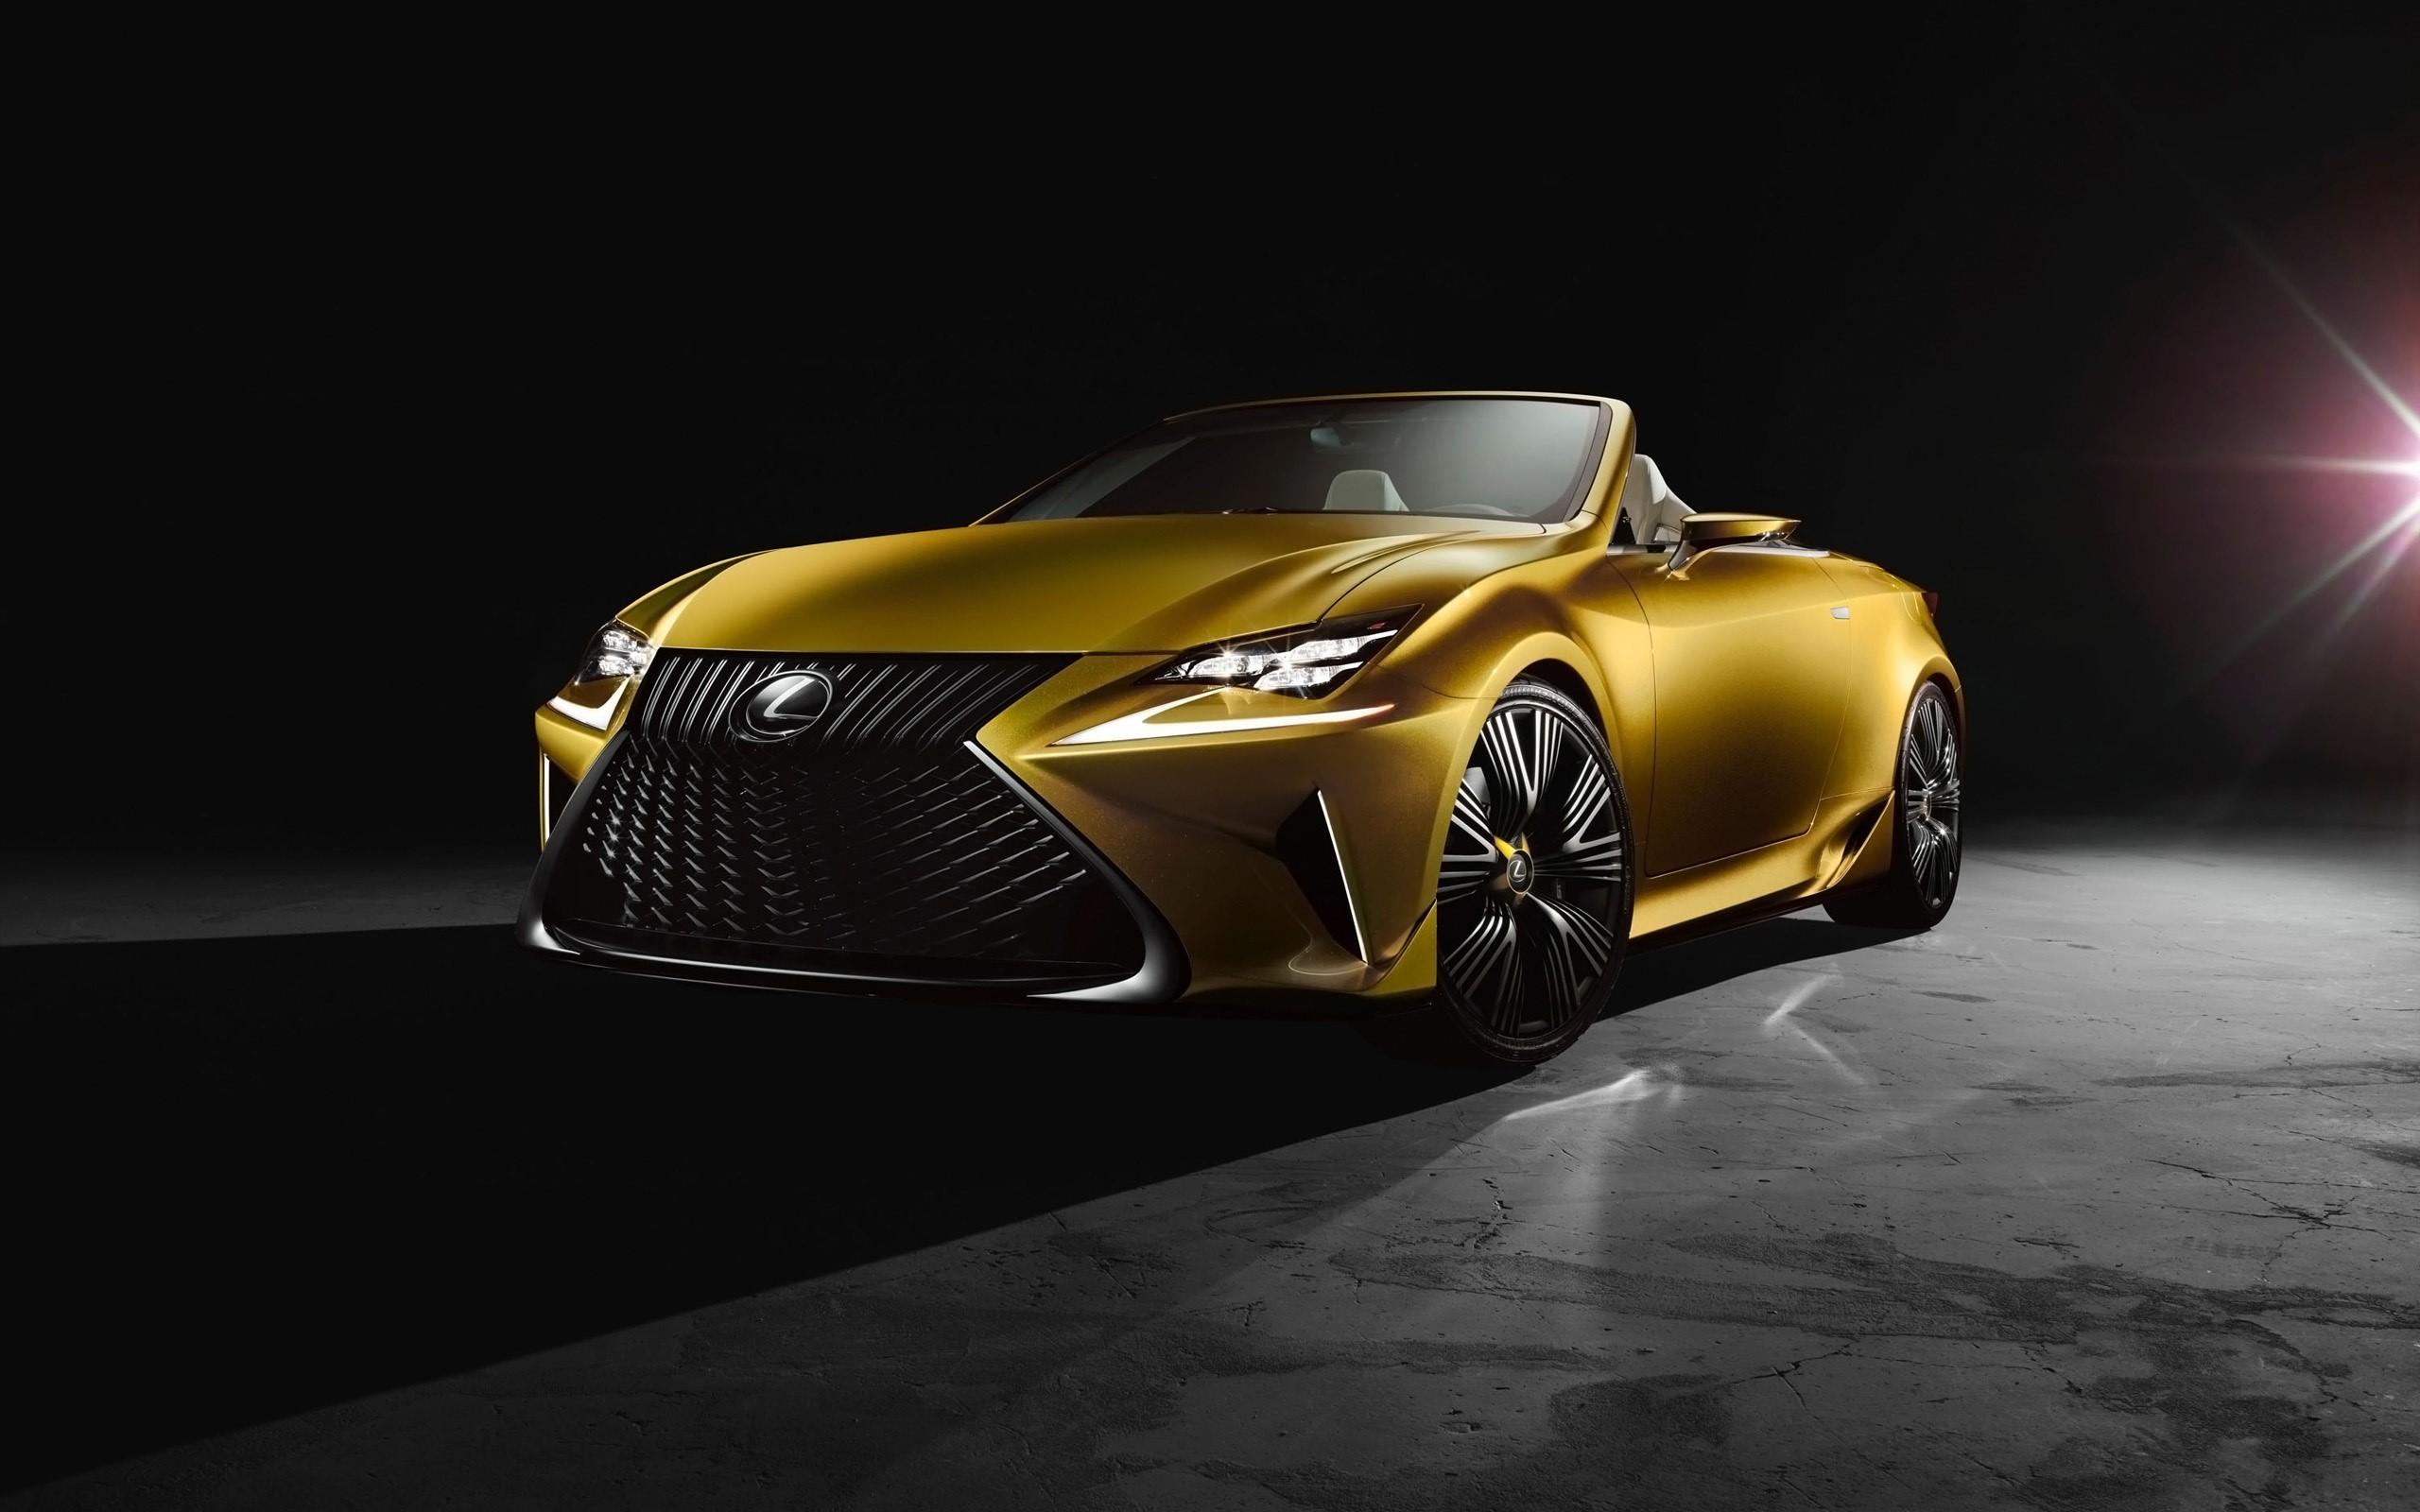 Fondos de pantalla Lexus lF C2 Concept